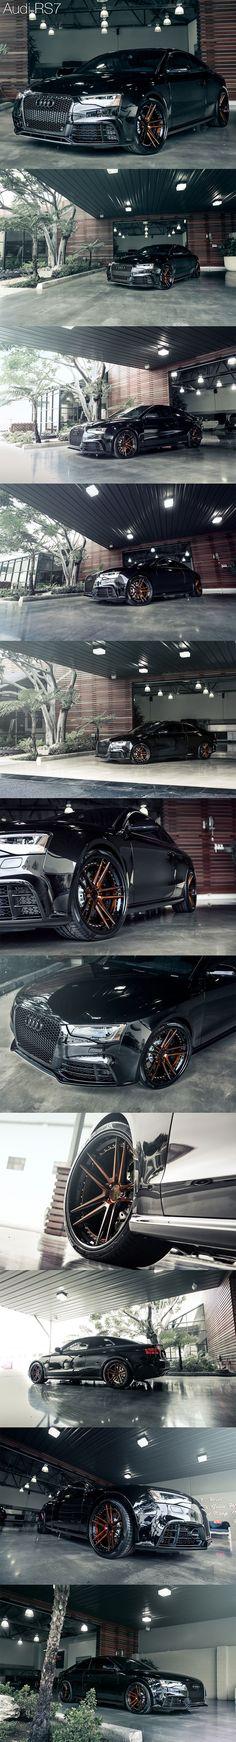 Audi S5. #carporn #architectureporn